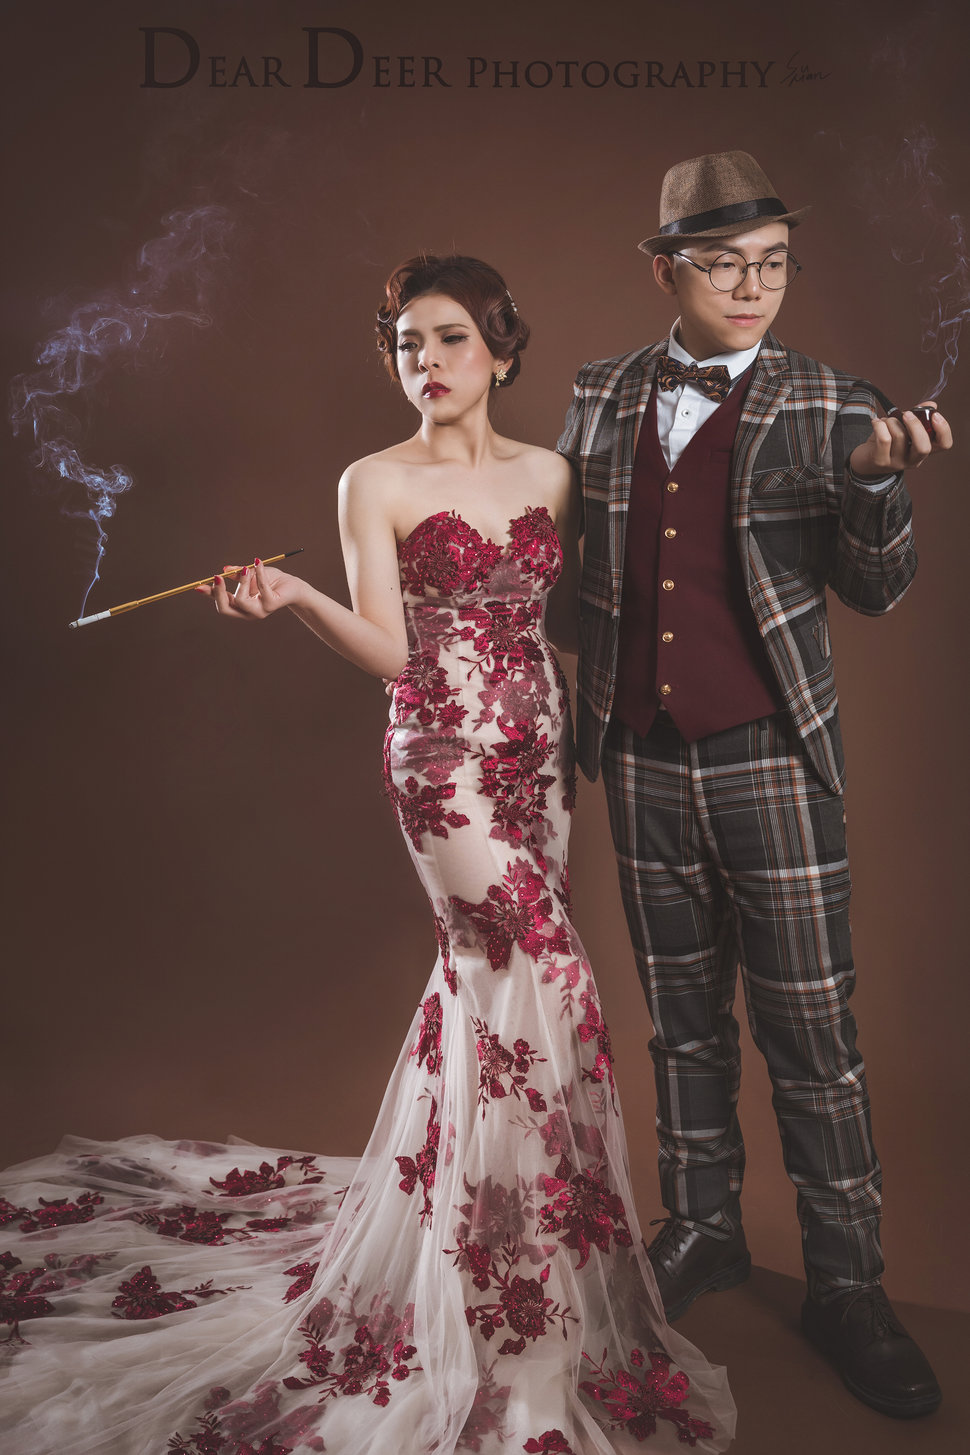 Dear Deer 復古風格(編號:1595862) - Dear Deer鹿兒攝影 女攝影師蘇蔓 - 結婚吧